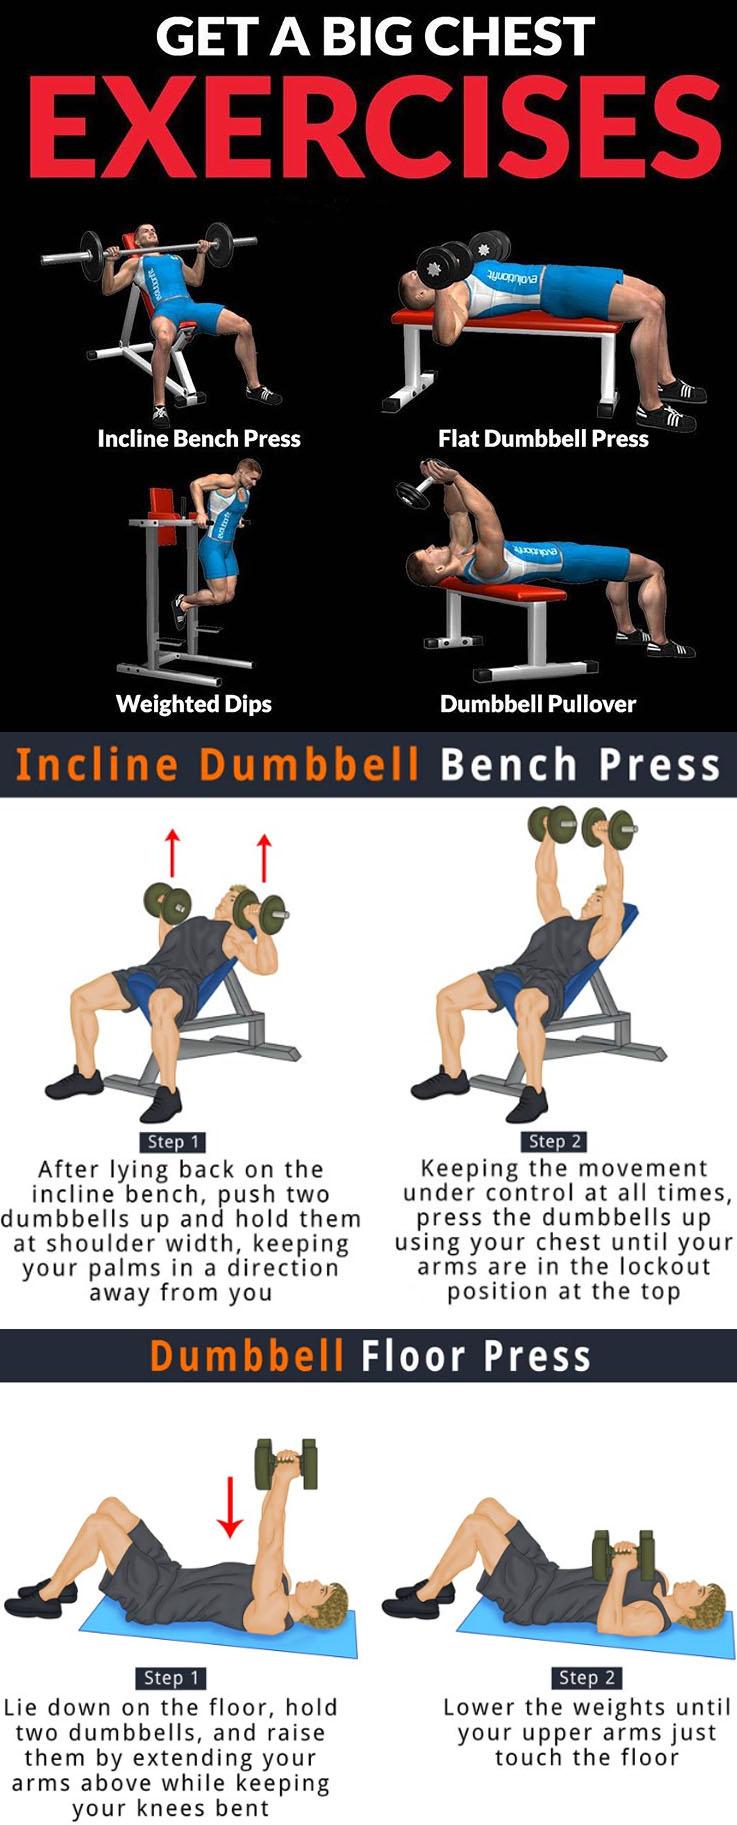 Big Chest Exercises